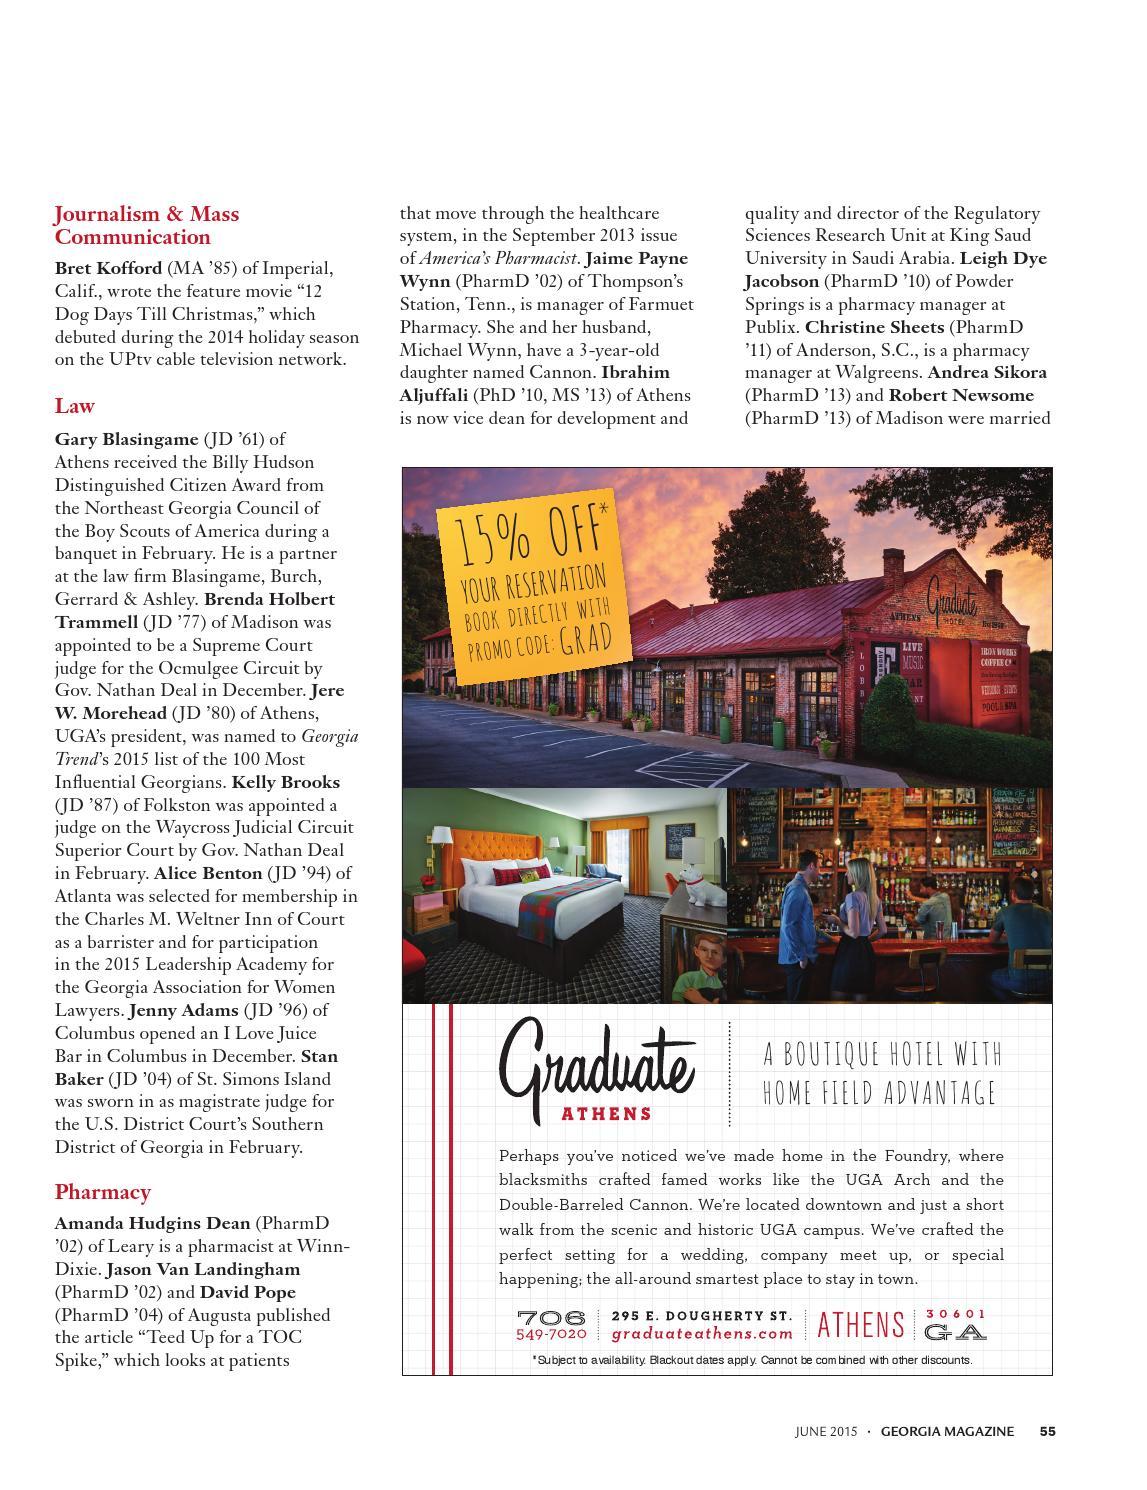 Georgia Magazine June 2015 by University of Georgia Alumni Magazine ...